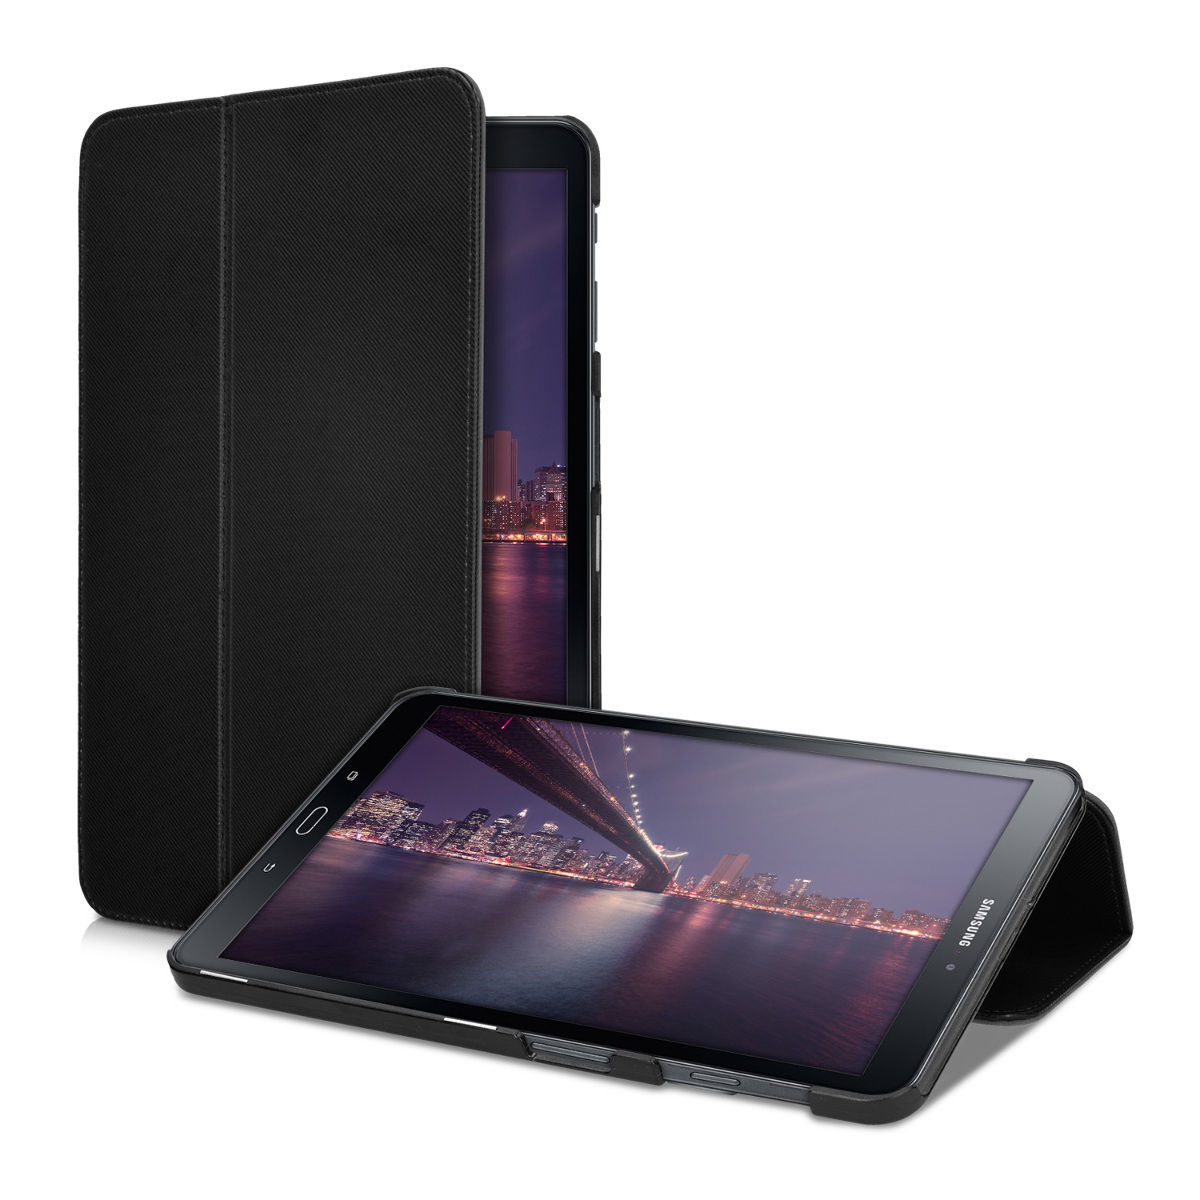 Pouzdro pro Samsung Galaxy Tab A 10.1 (2016) černé